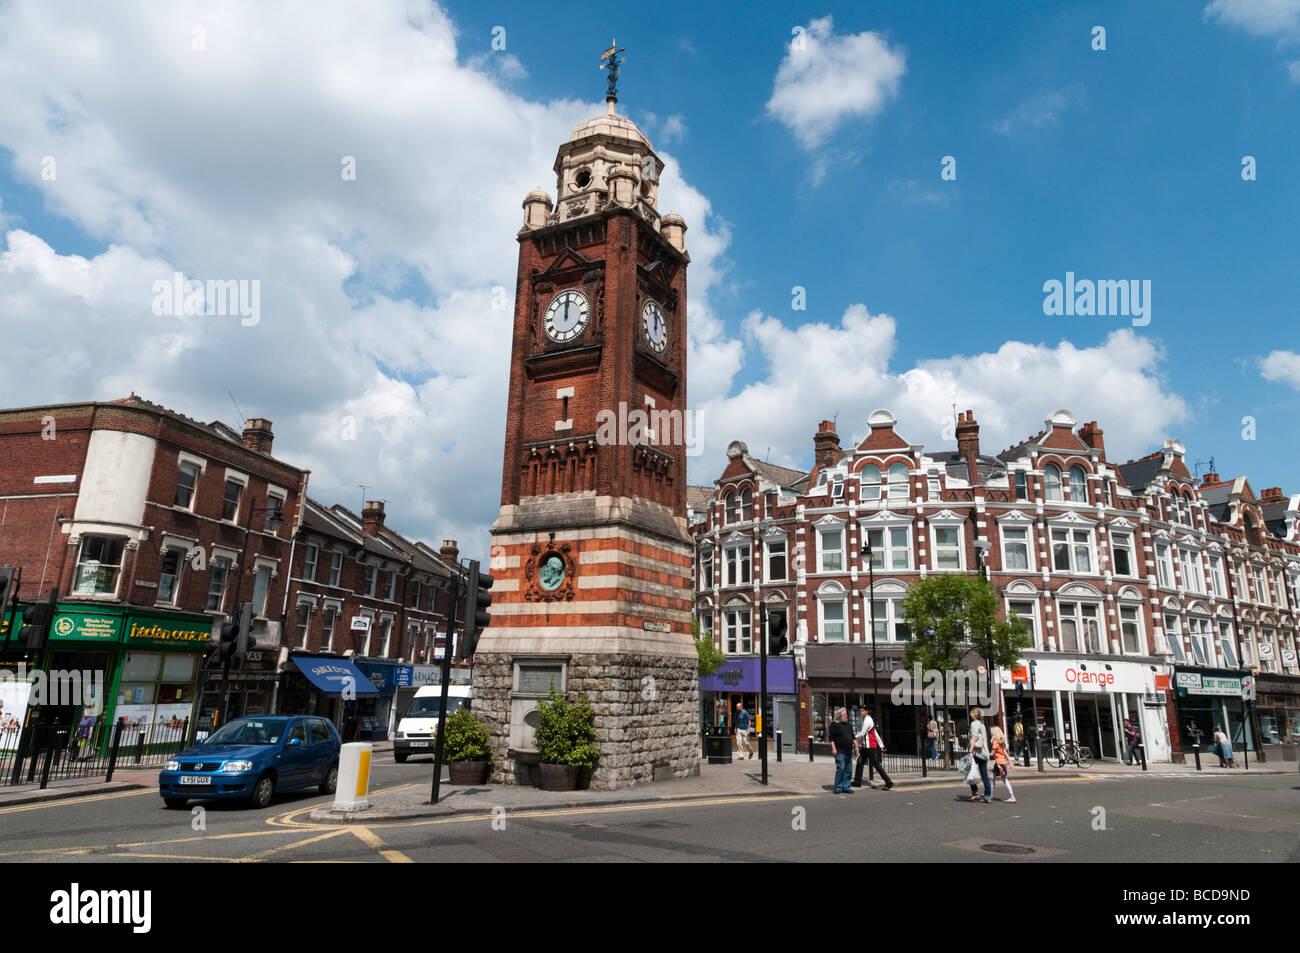 La torre del reloj en Crouch End, Londres Inglaterra Imagen De Stock